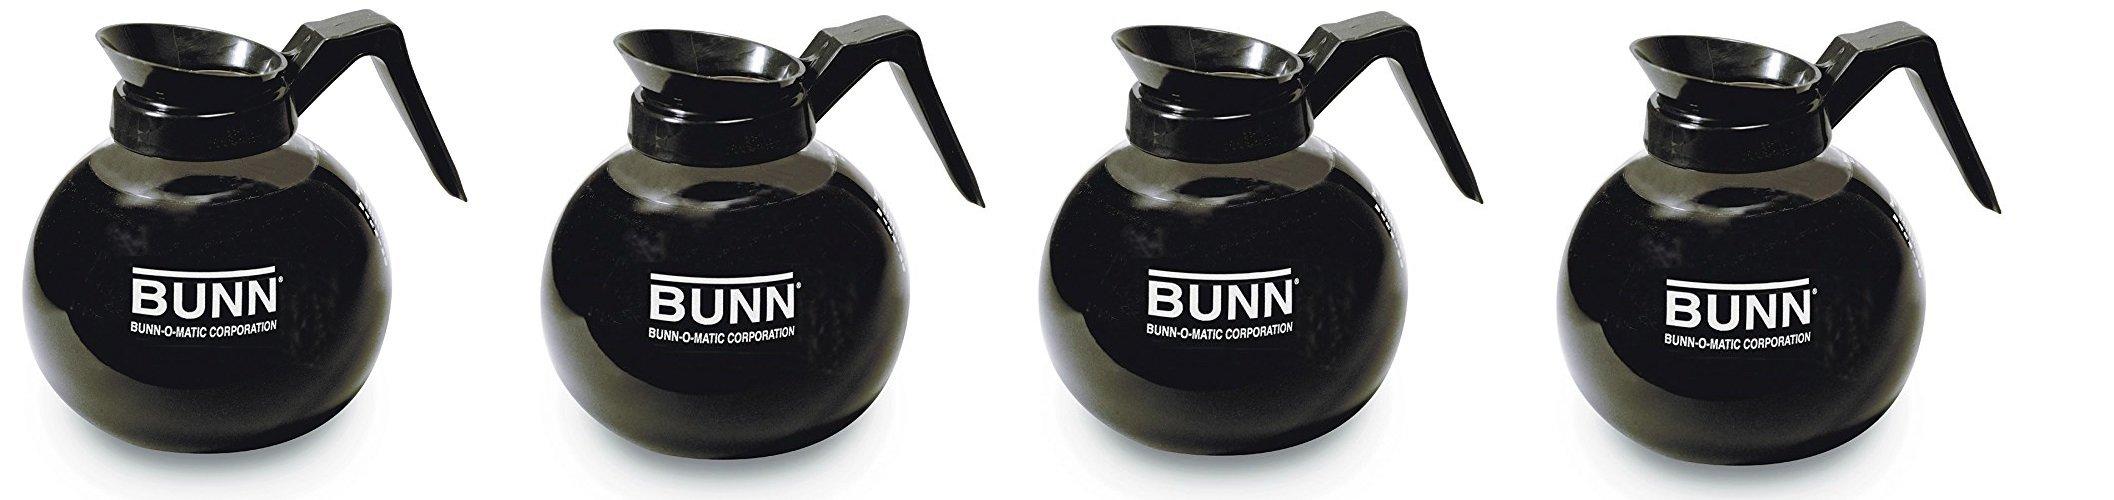 BUNN 12-Cup Glass Coffee Decanter, Black rGzPkV, 4Pack (Coffee Decanter)